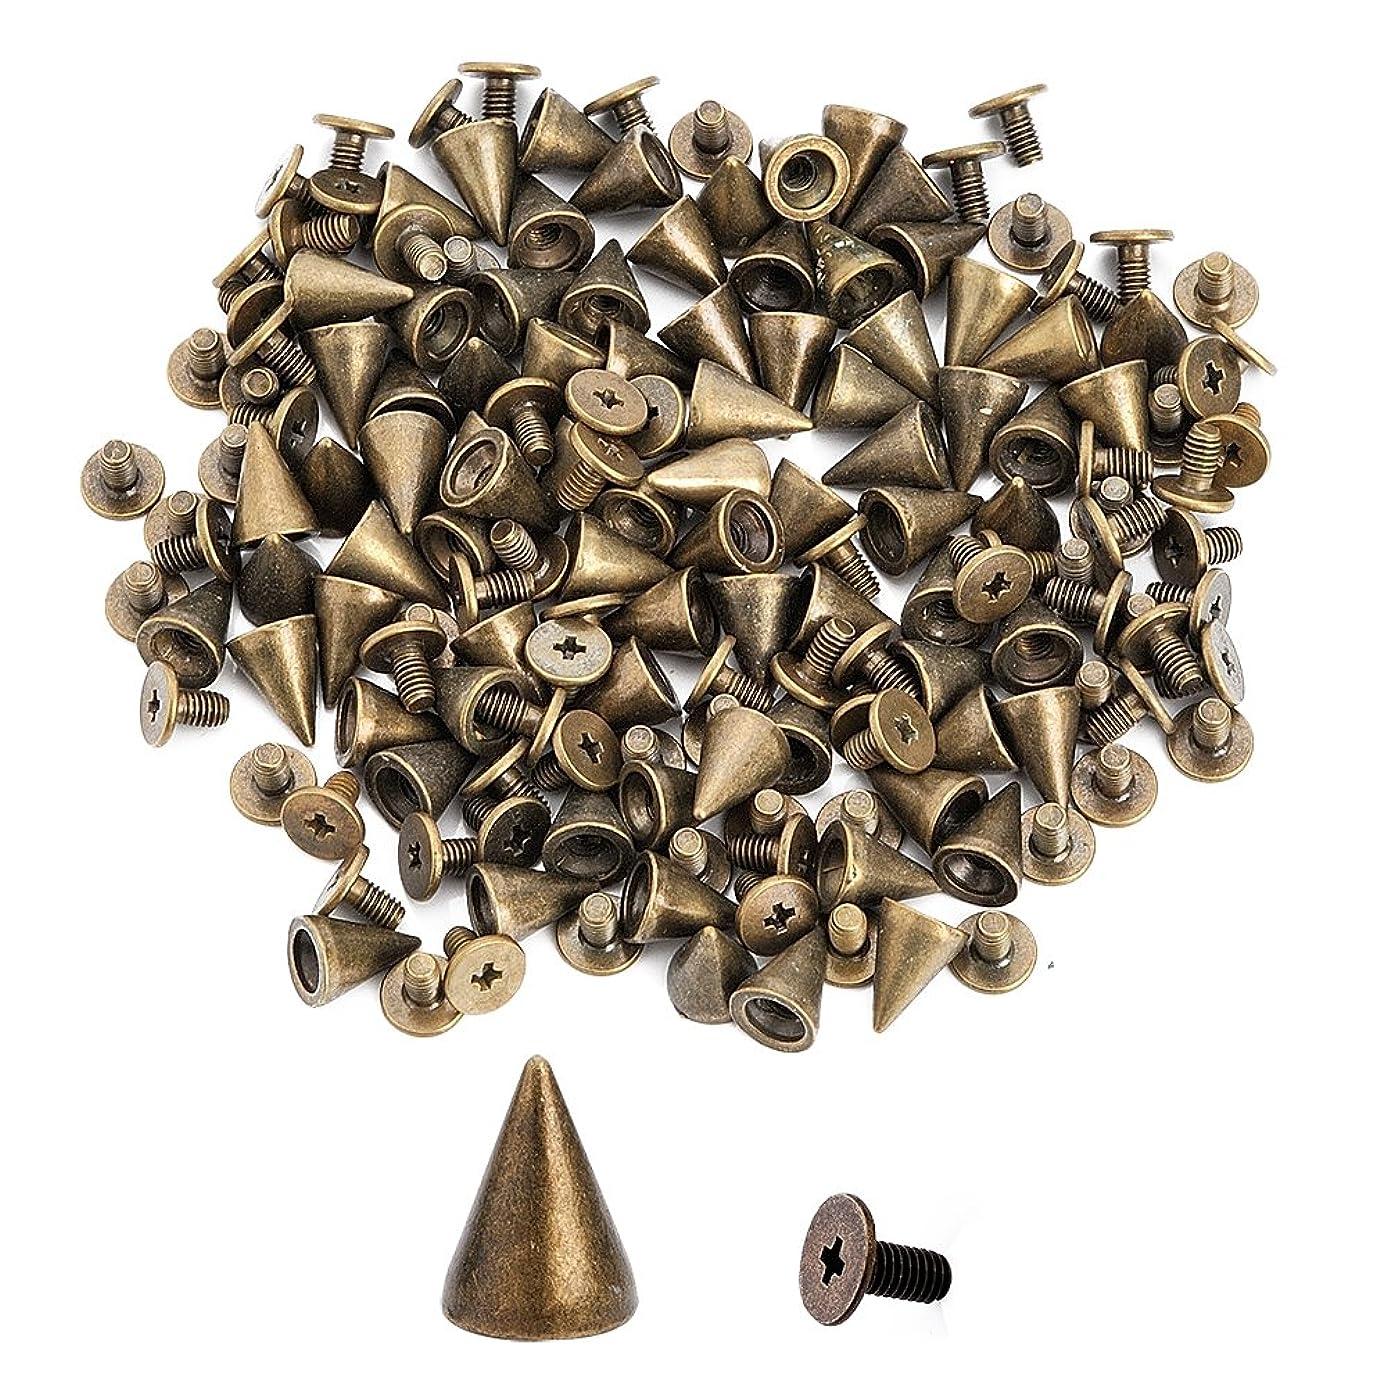 100pcs Cone Spikes Screwback Studs DIY Craft Cool Rivets Punk Stud Coincal 7x10mm 1/4